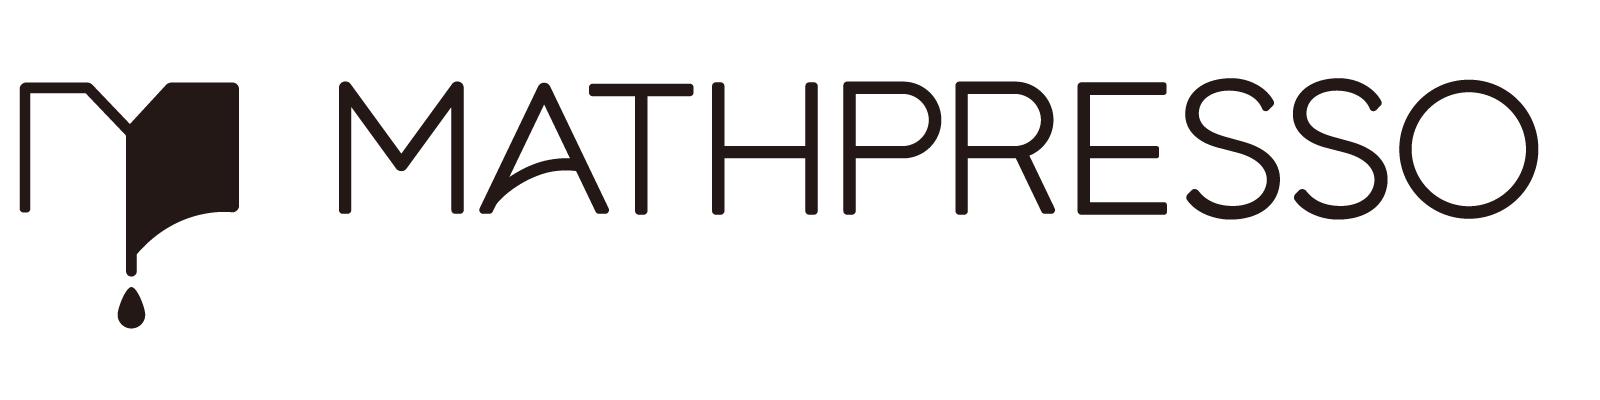 Mathpresso logo